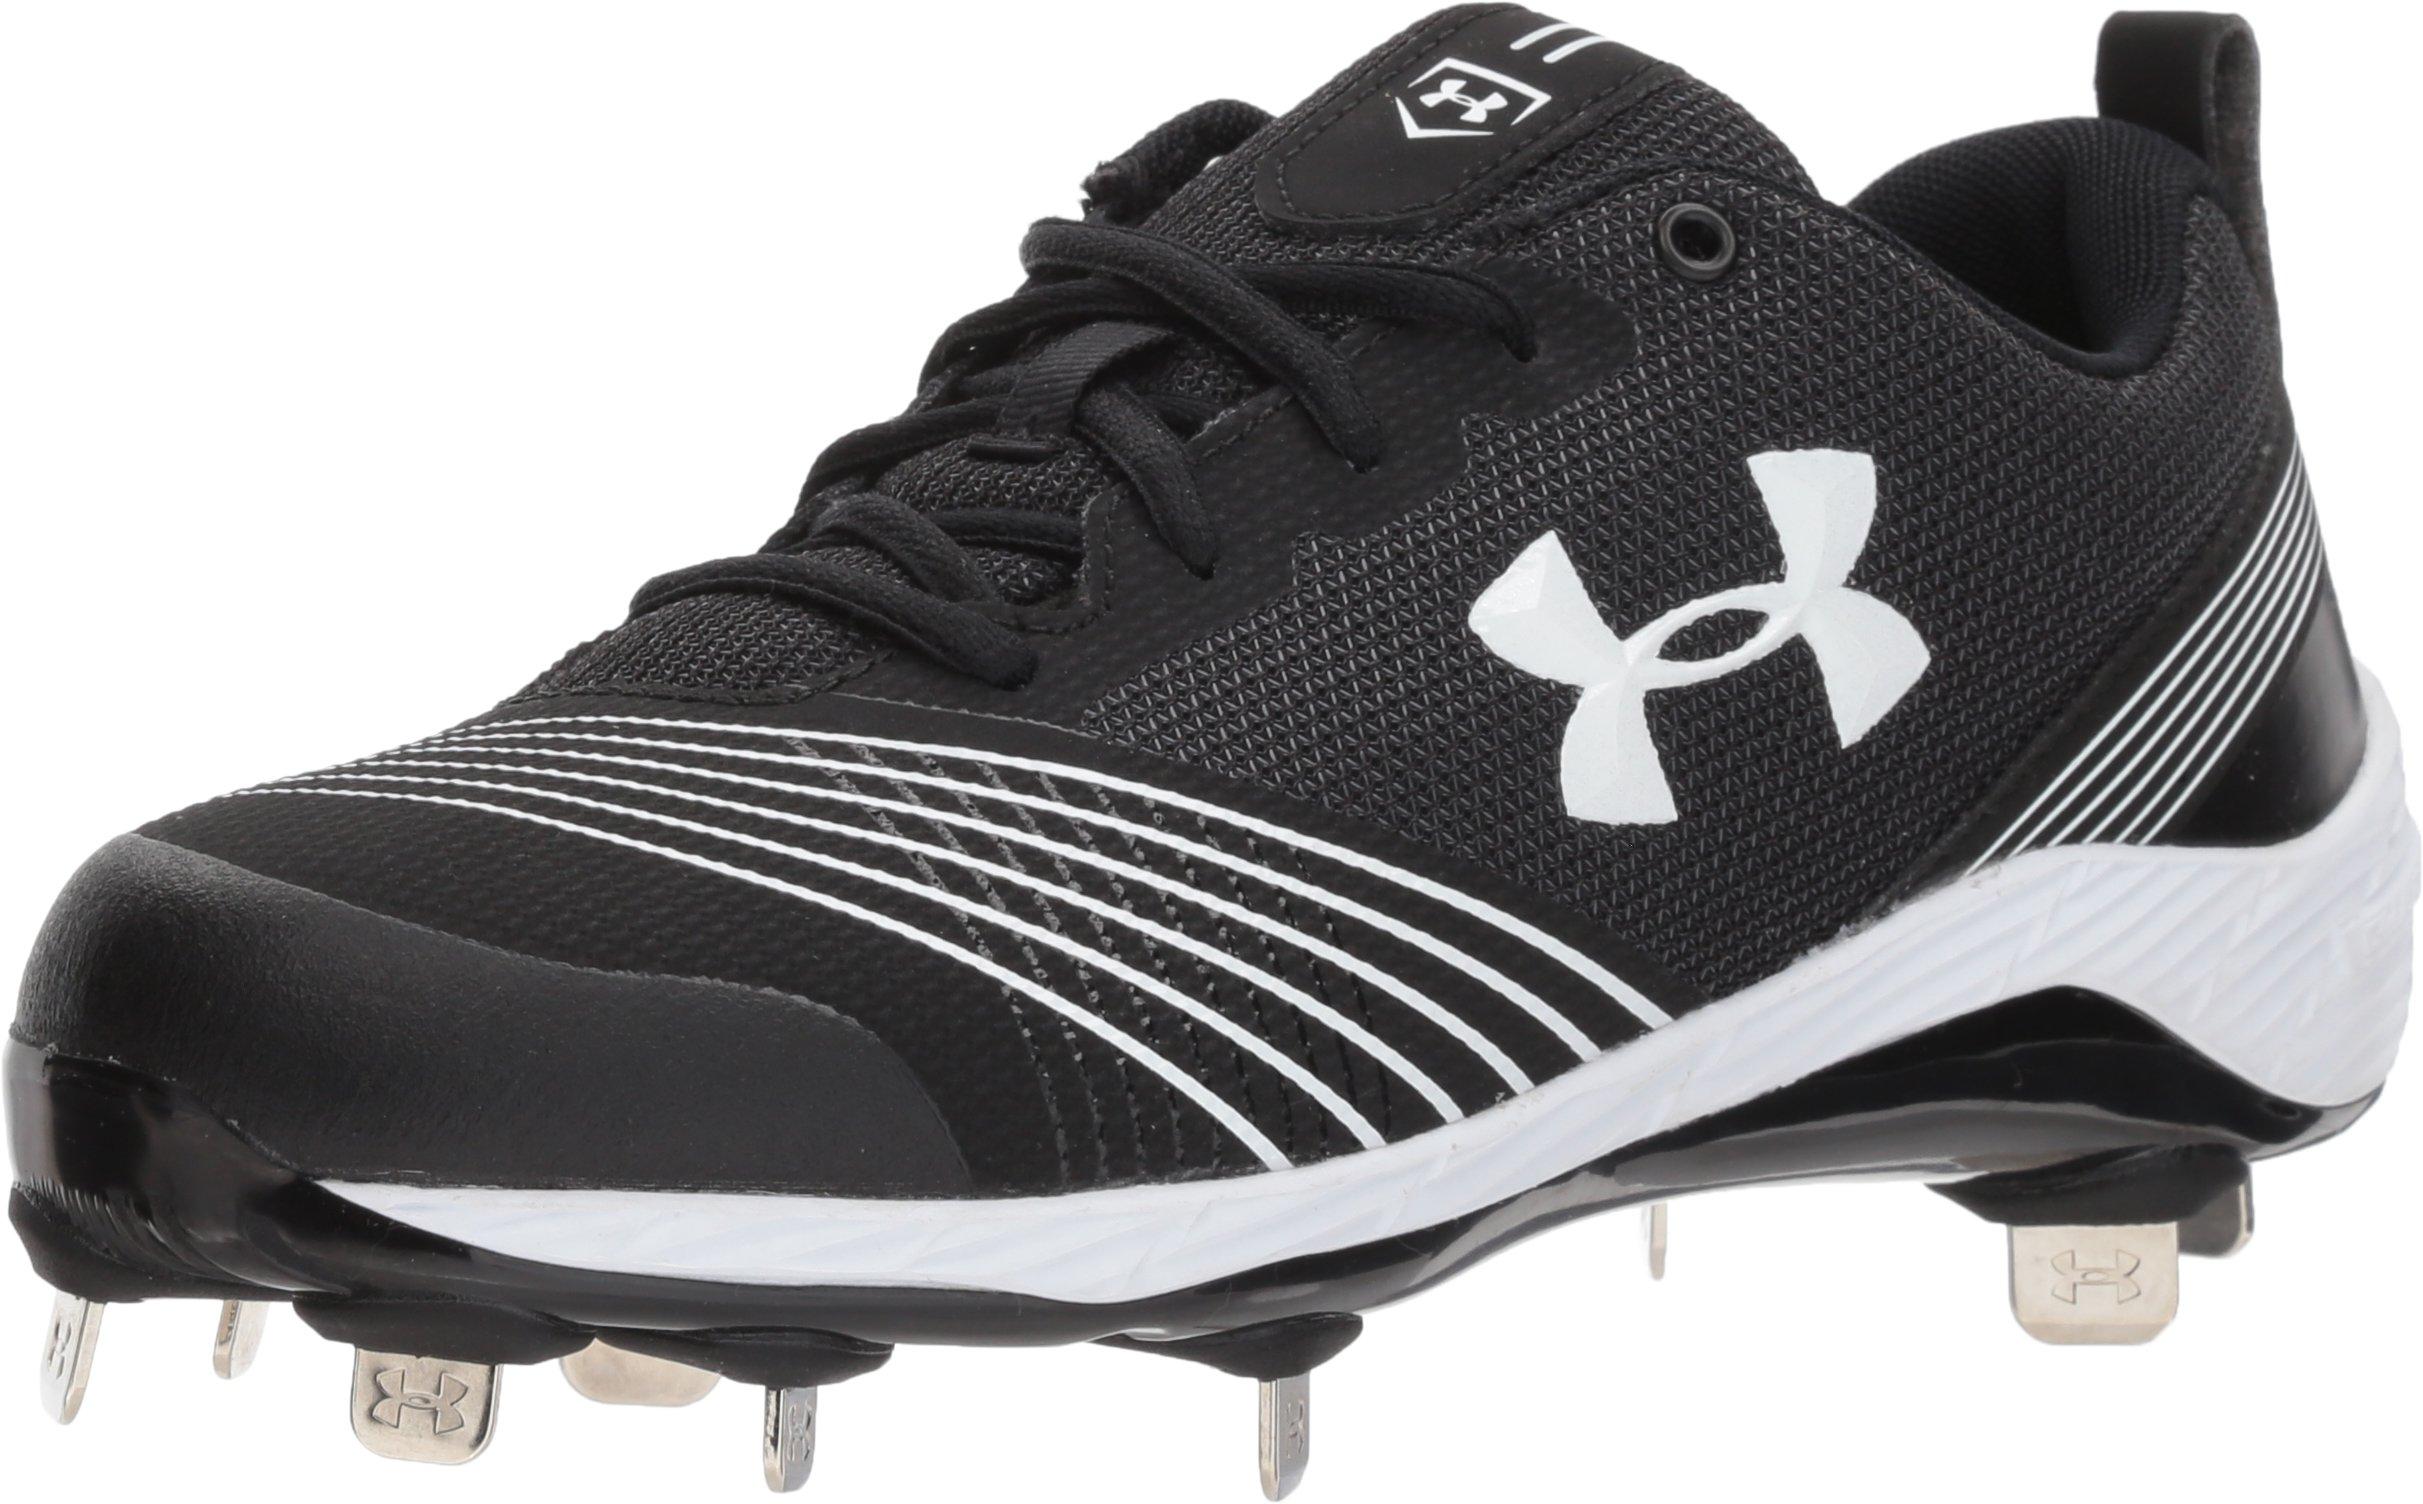 Under Armour Women's Glyde ST Softball Shoe, Black (011)/Black, 8